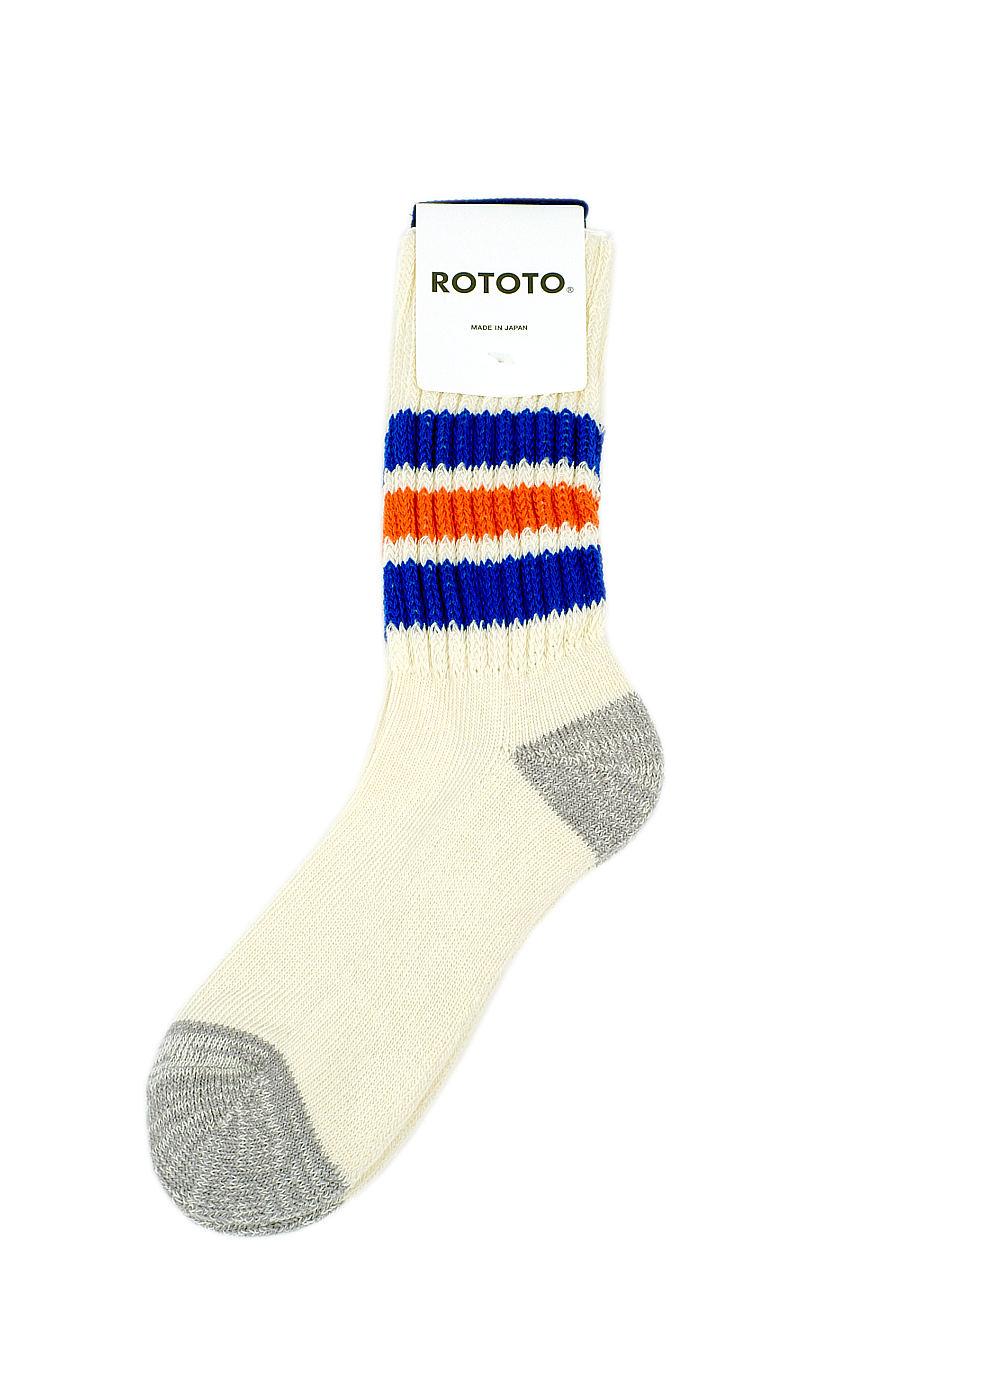 Rototo-coarse-ribbed-oldschool-socks-blueorange-01